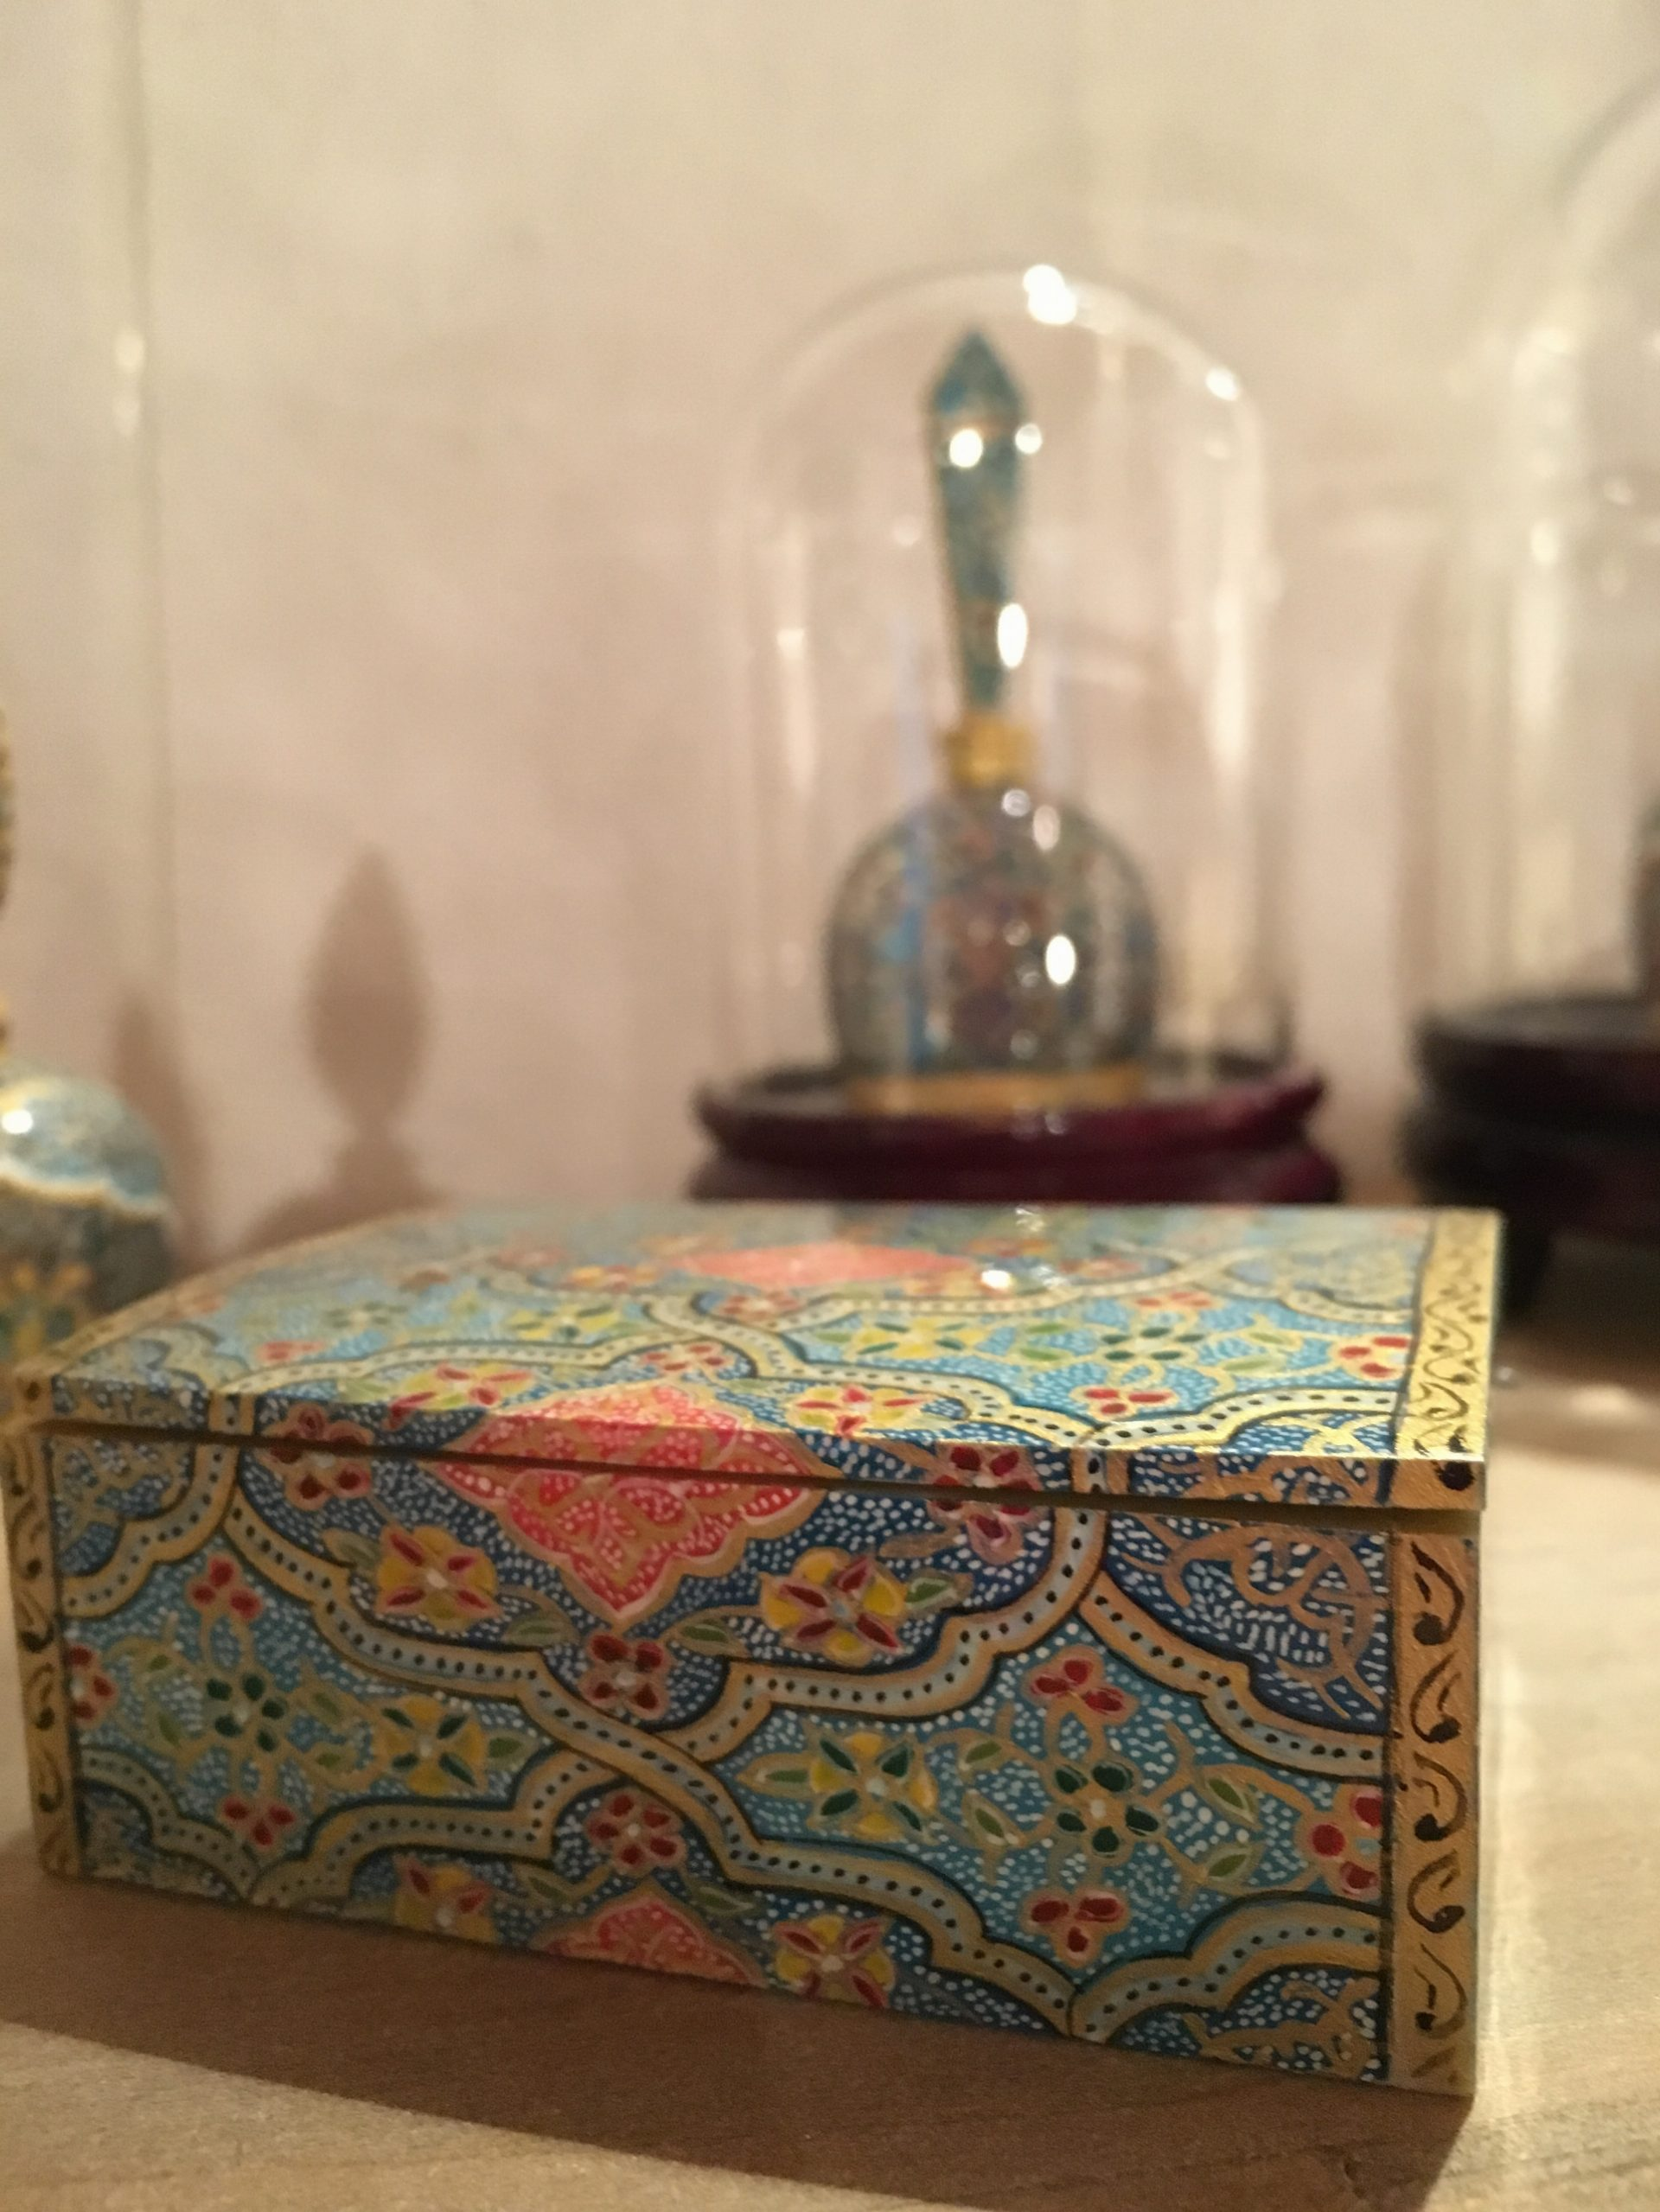 Miniature persiane in osso